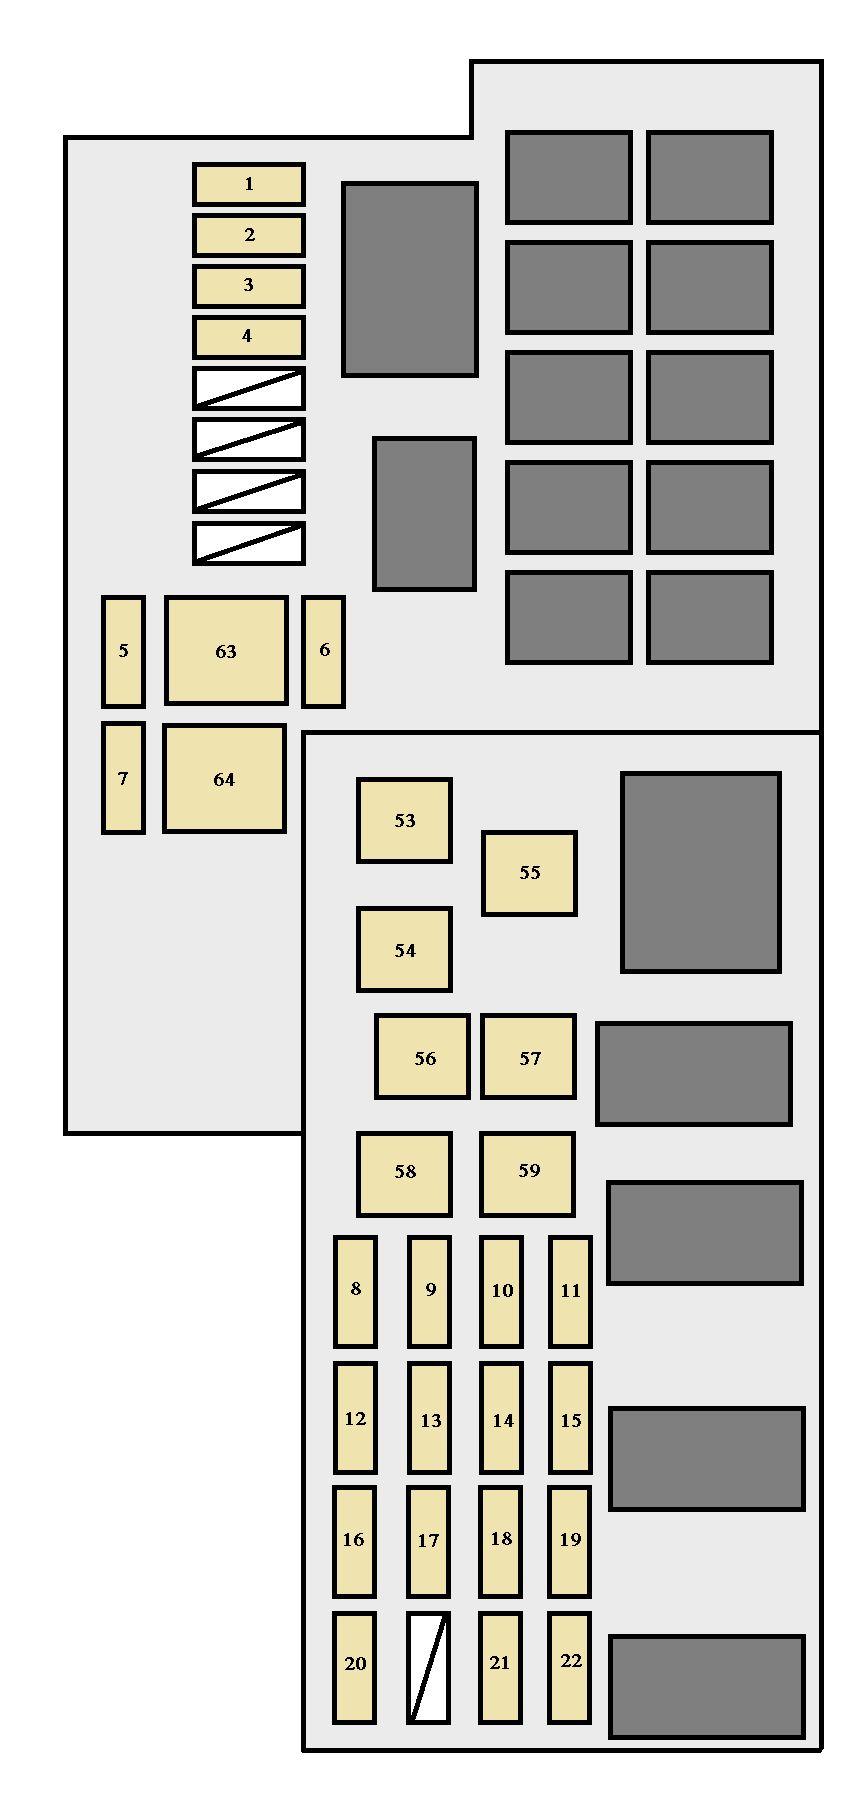 1999 camry fuse diagram schematic ev 6605  fuse box diagram further toyota camry fuse box diagram on  toyota camry fuse box diagram